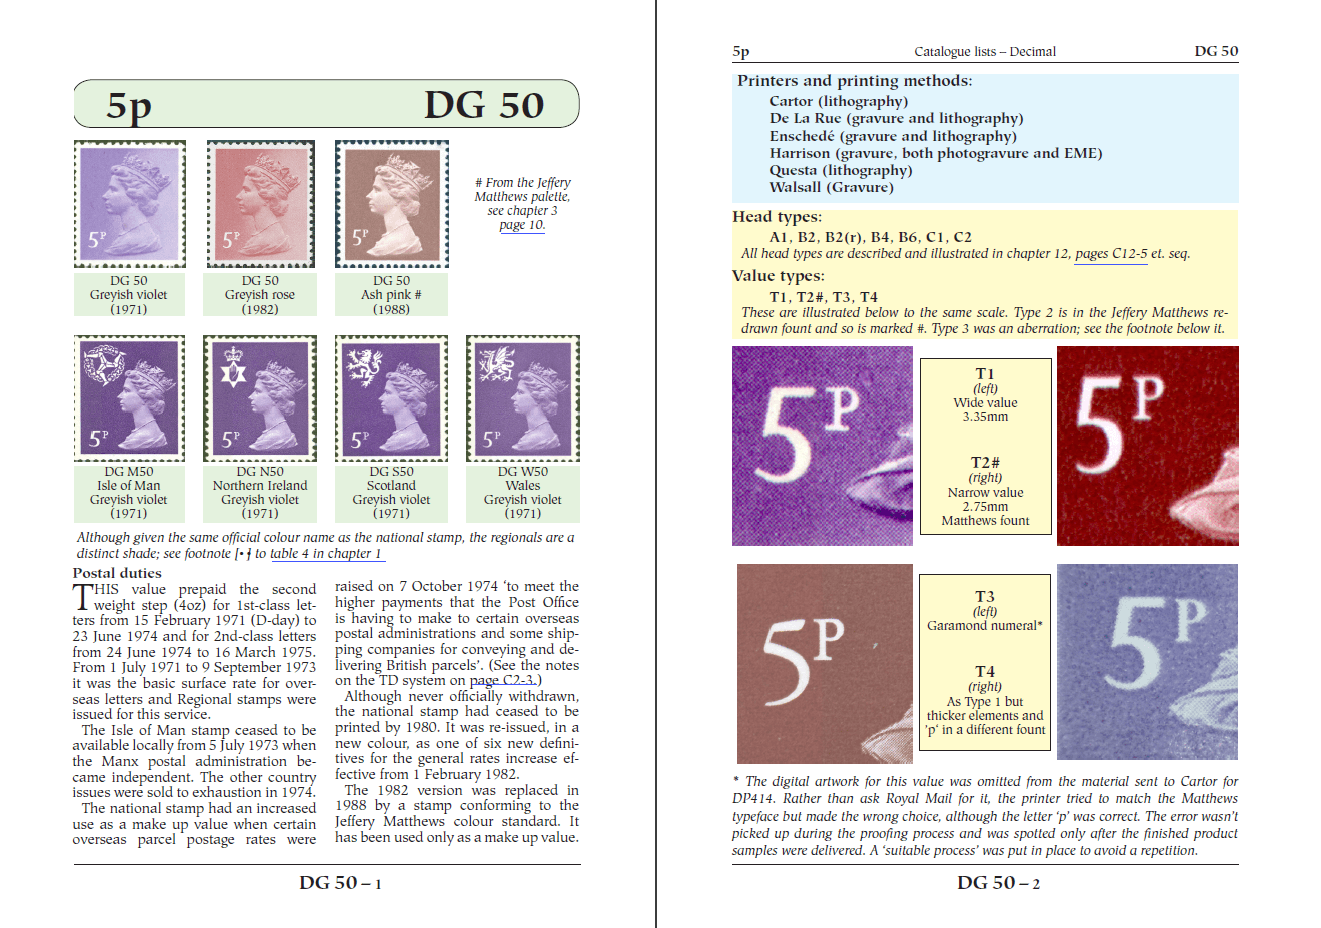 Handbook ukážka 1